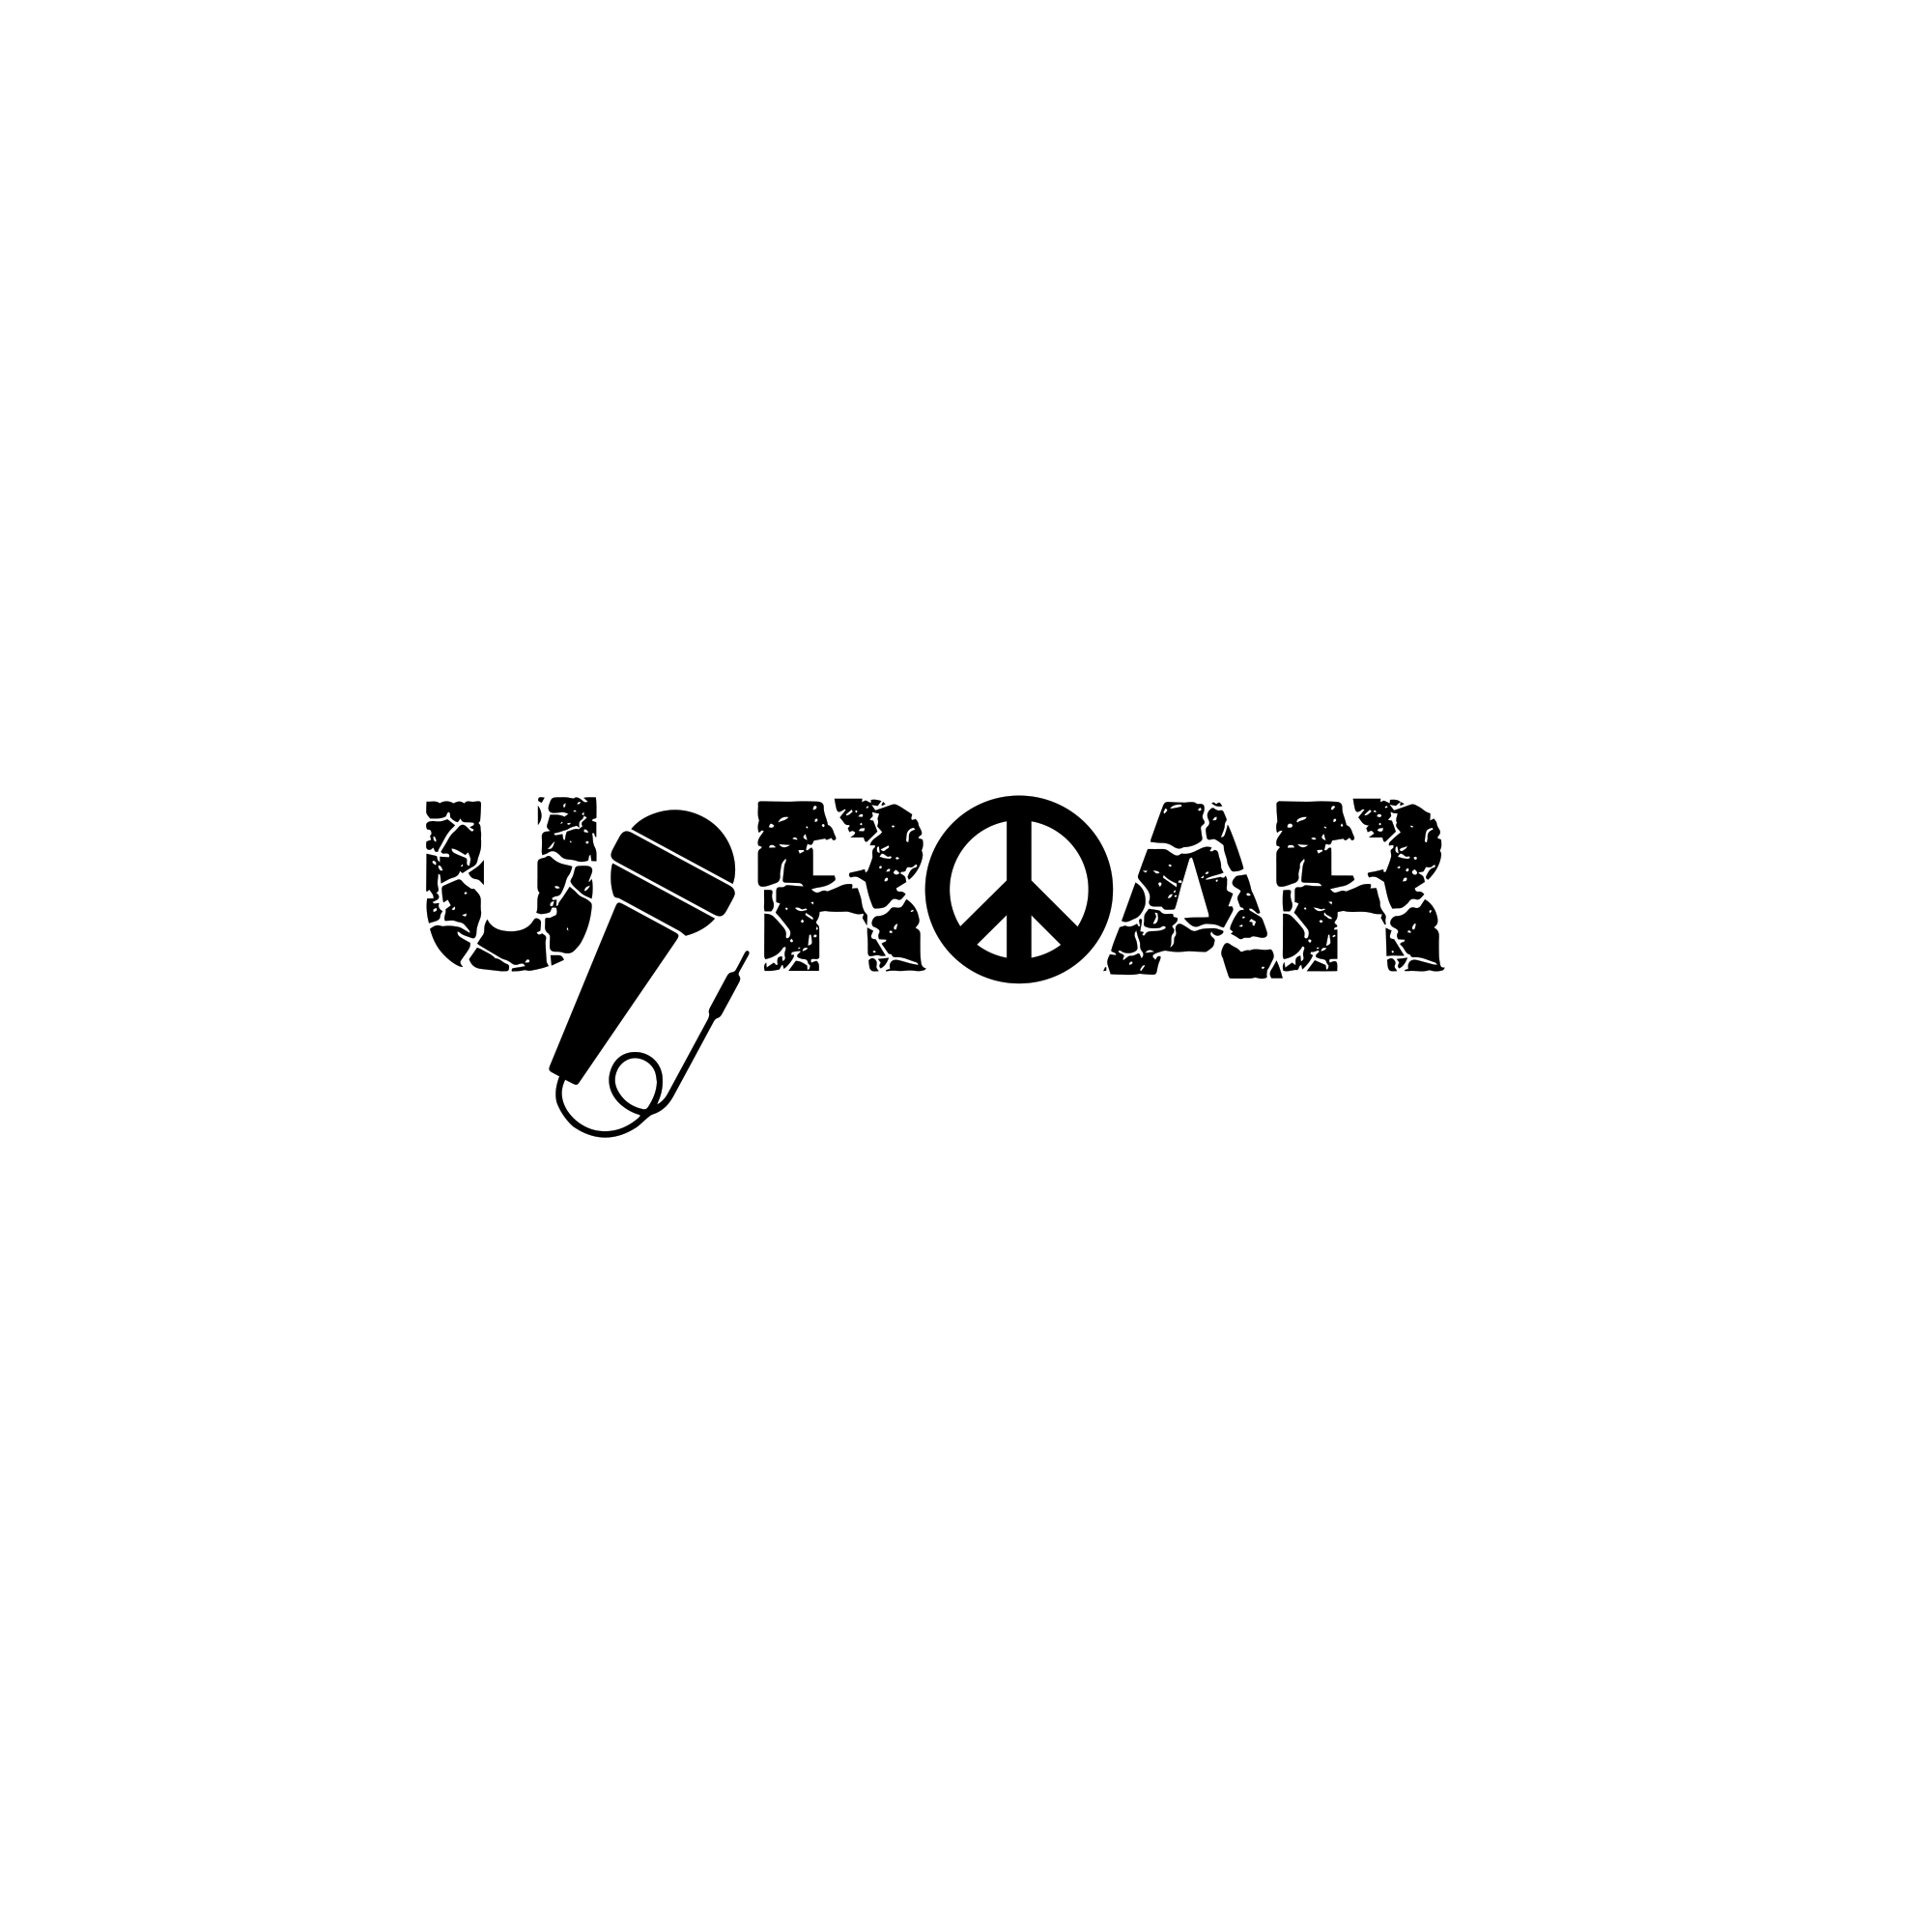 TheUproarProject